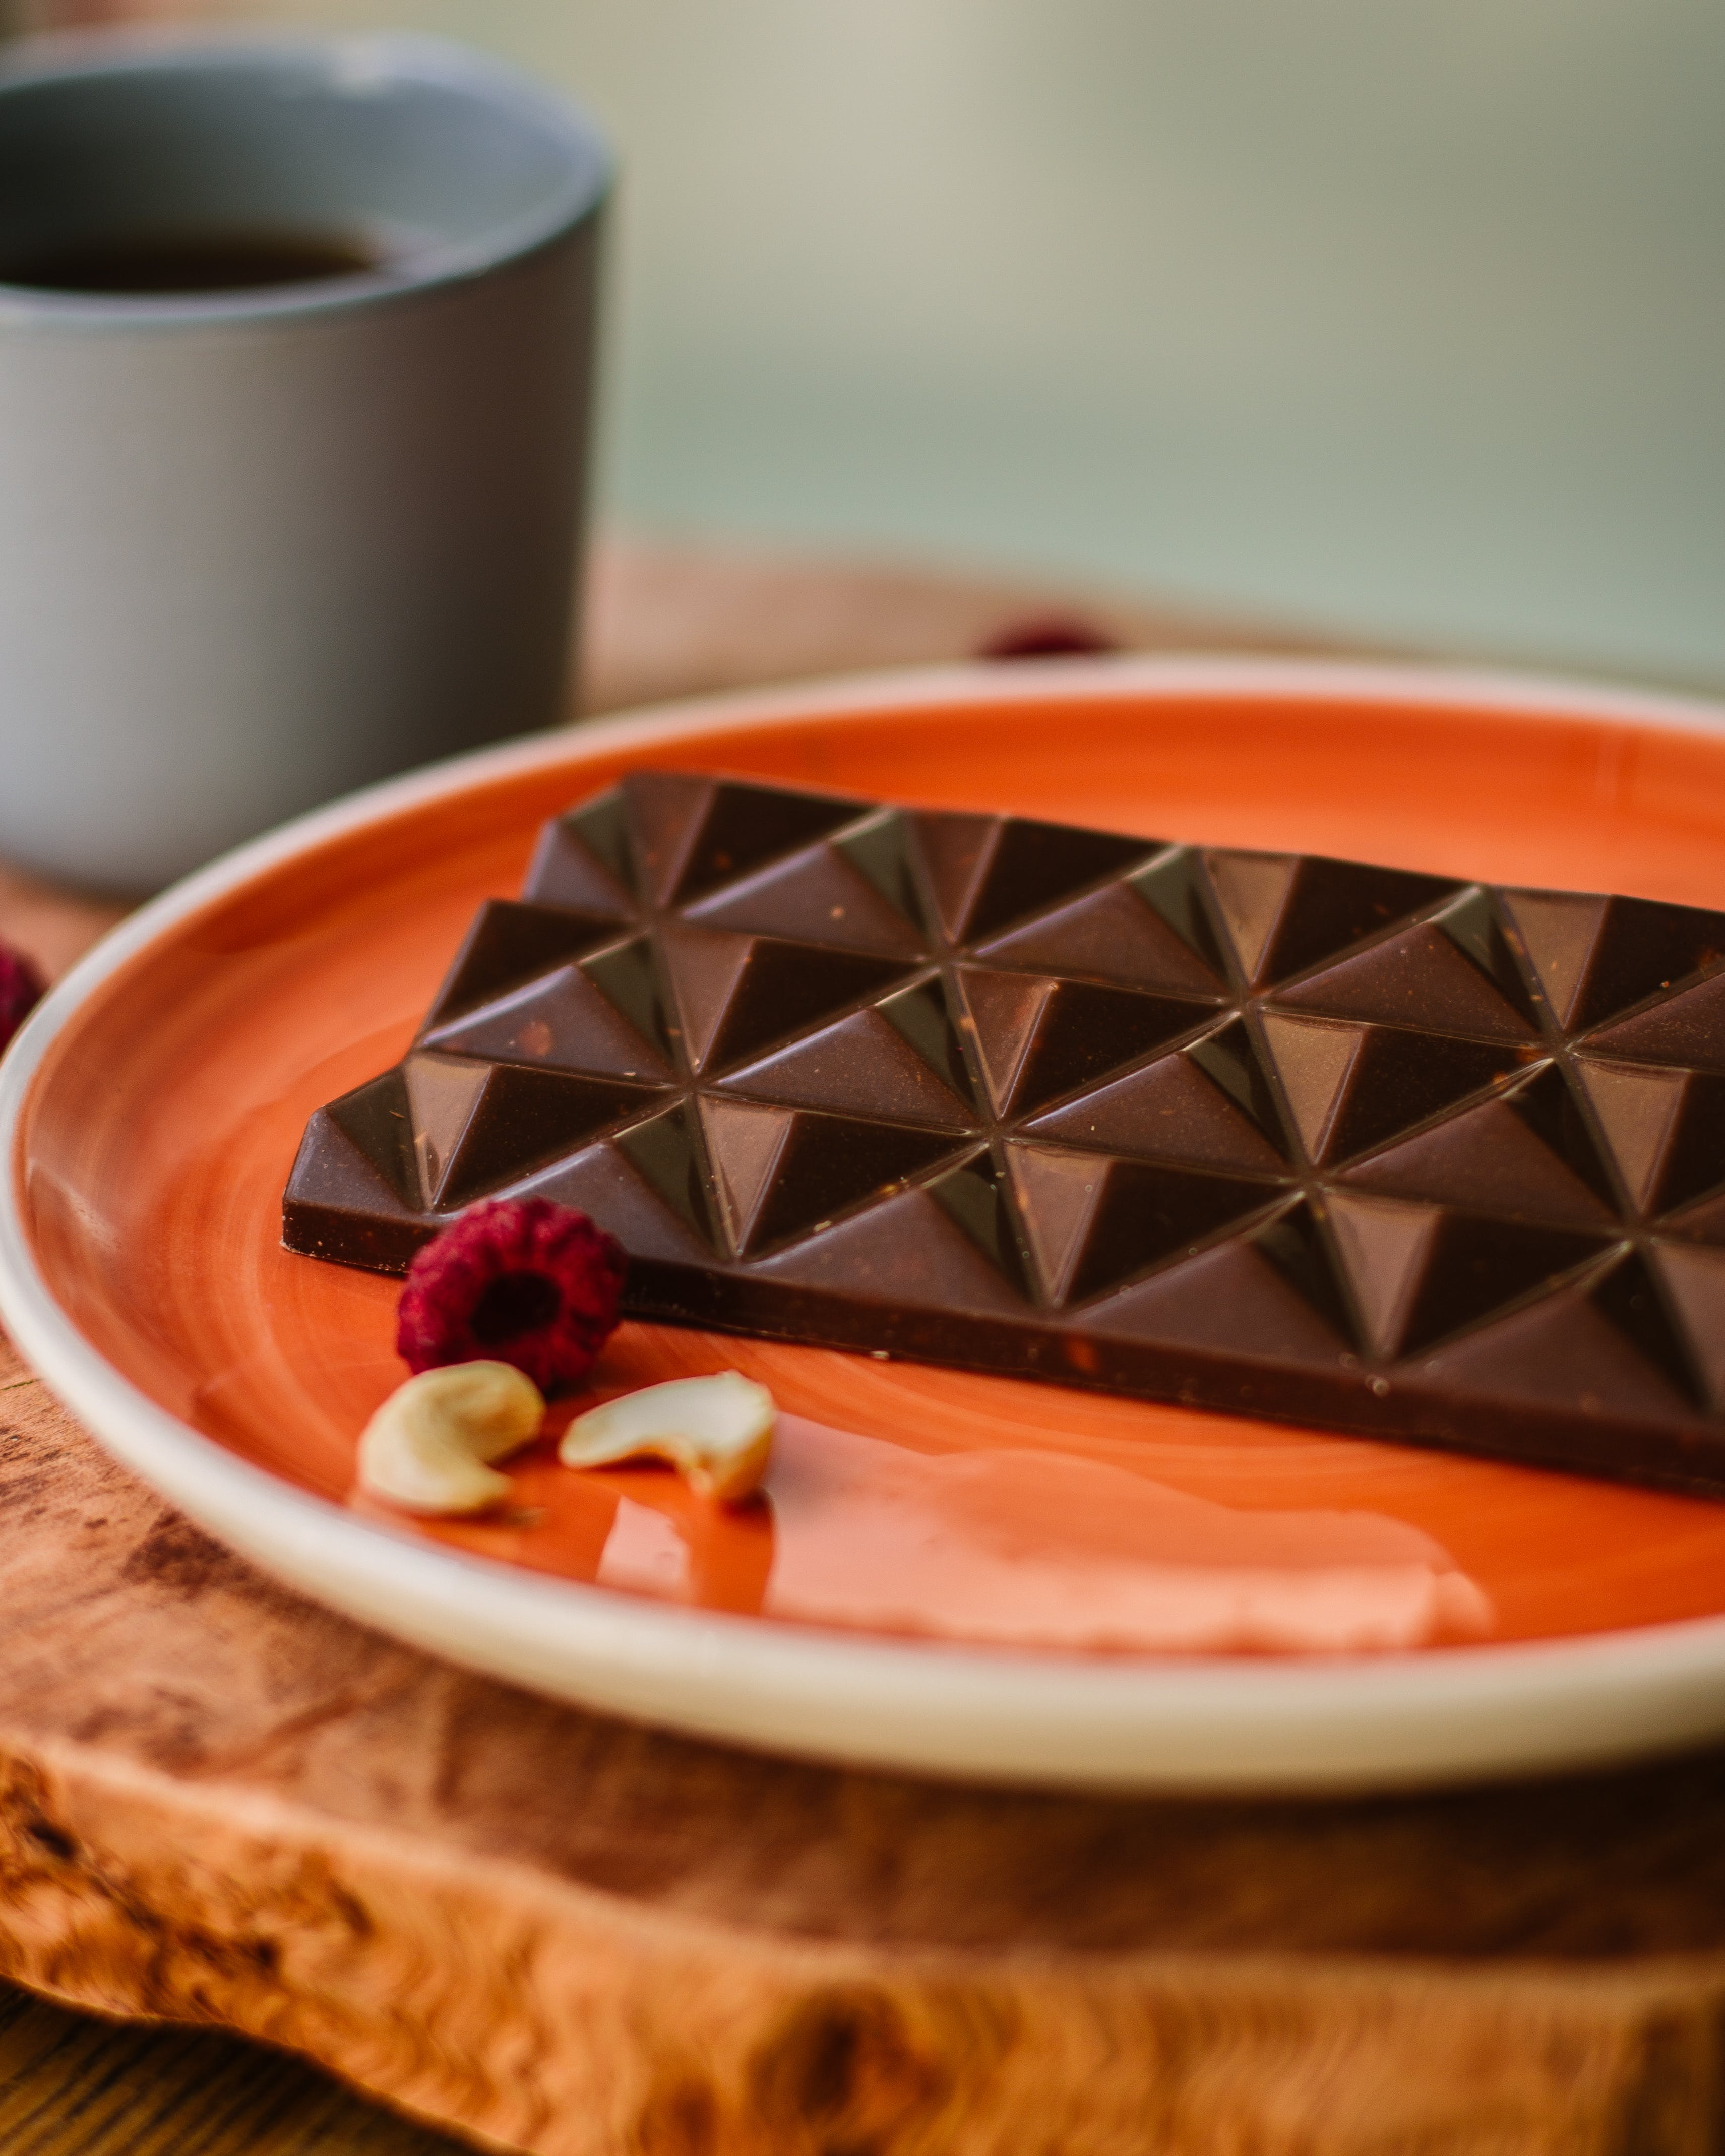 Gratis stockfoto met bord, cachou, chocoladereep, close-up